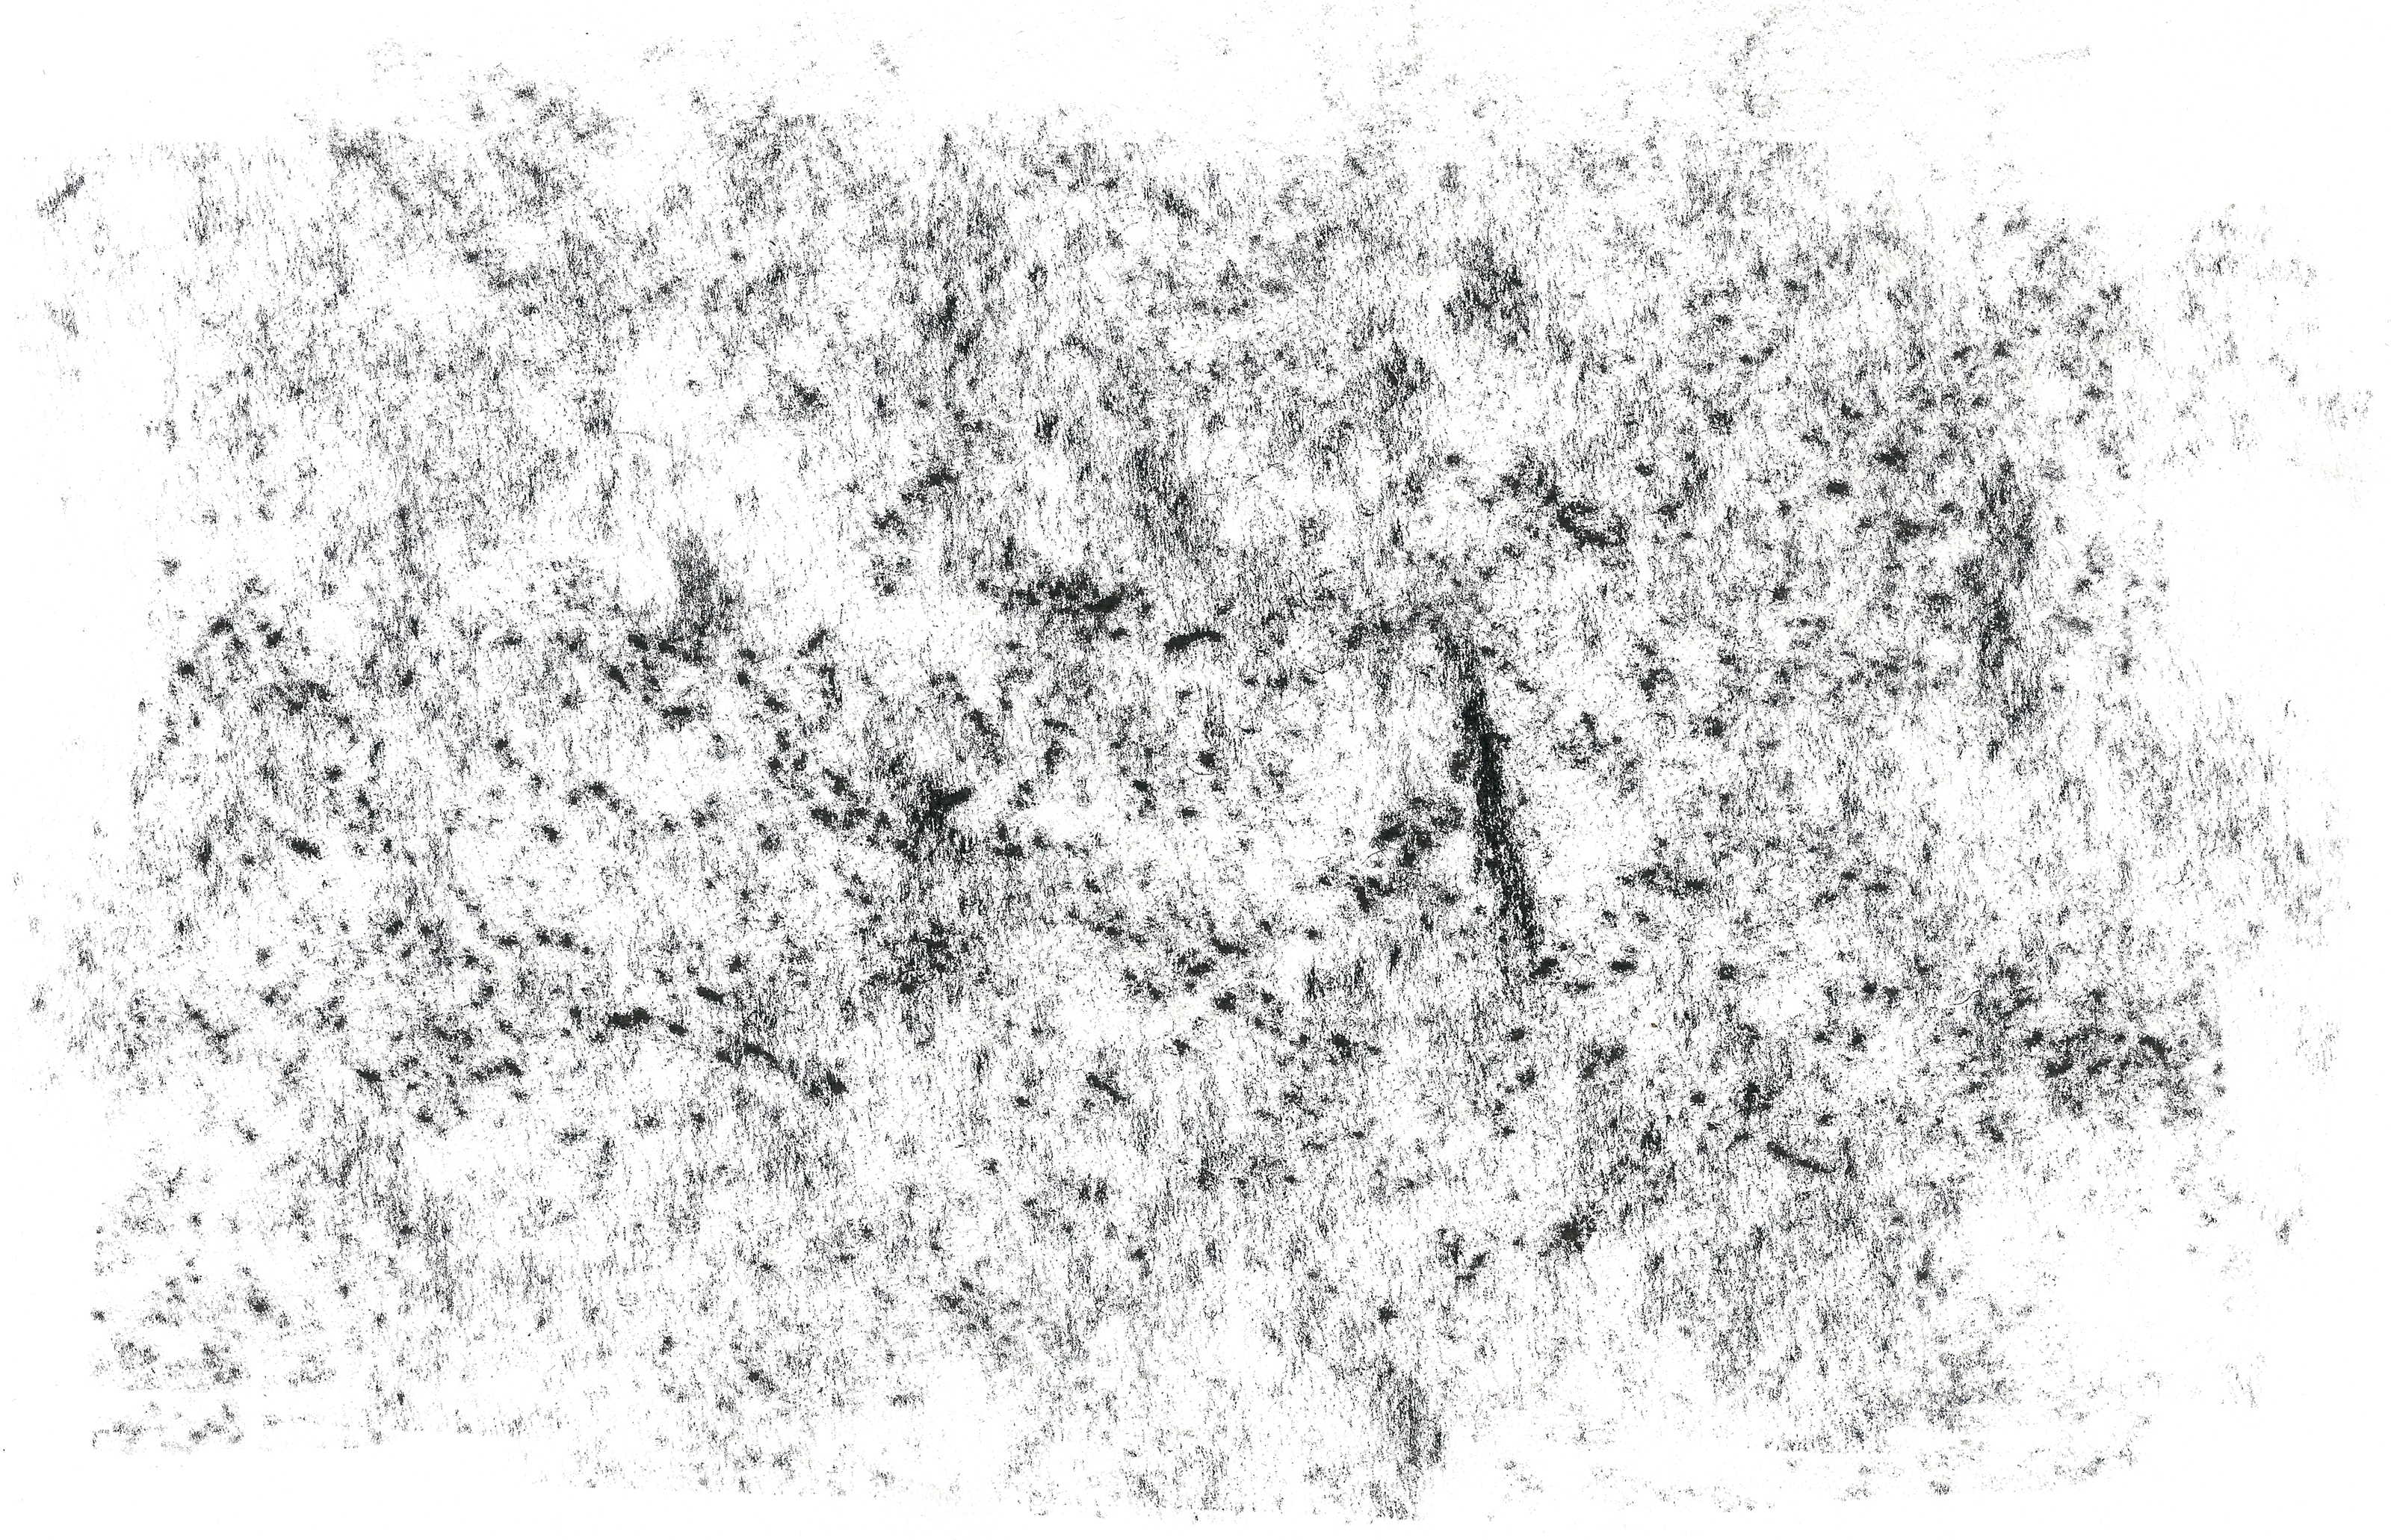 Light grunge texture photo